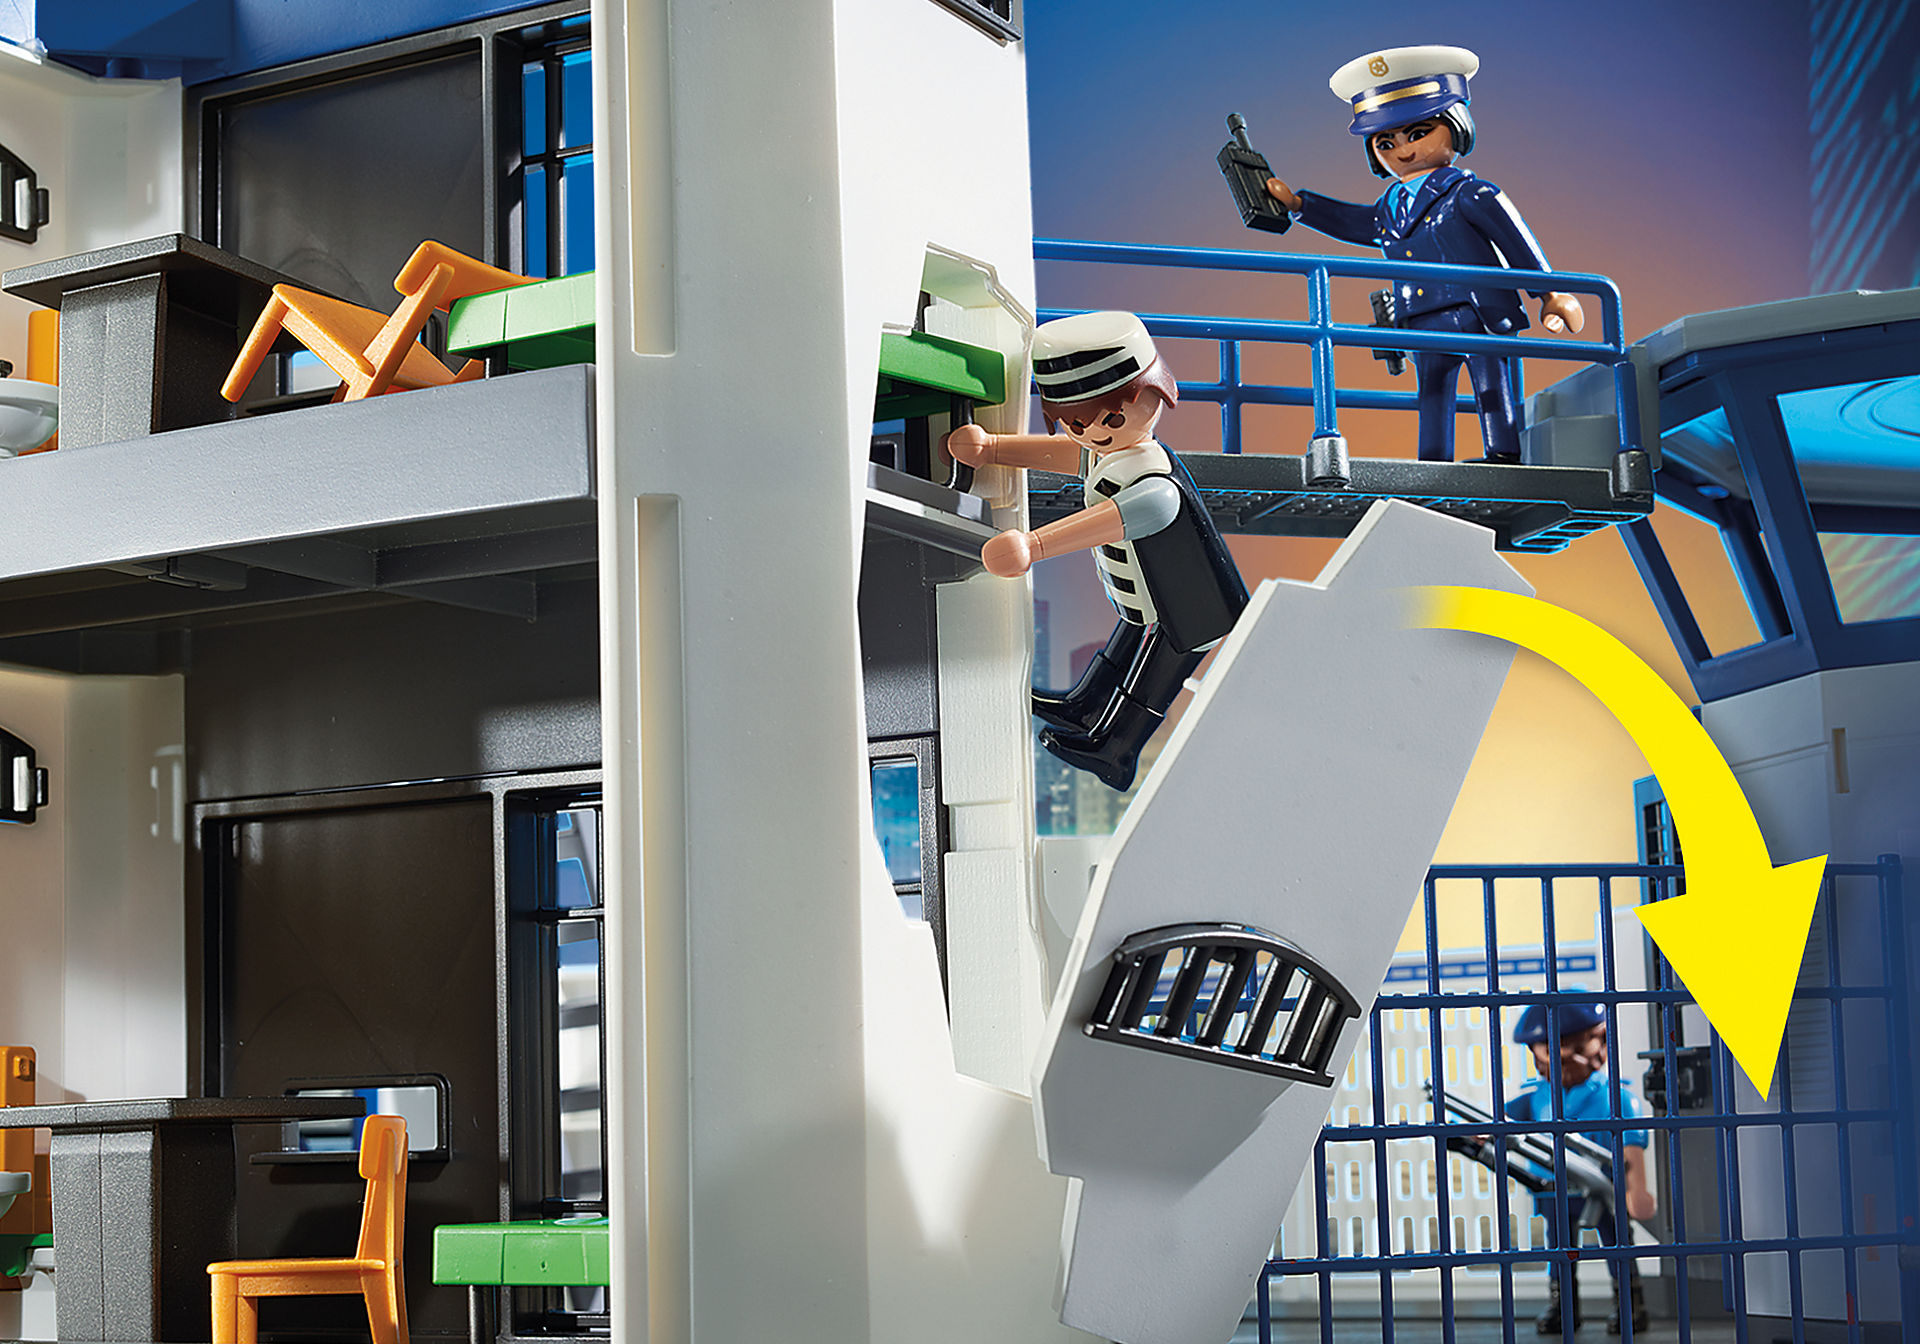 http://media.playmobil.com/i/playmobil/6872_product_extra3/Polizei-Kommandozentrale mit Gefängnis